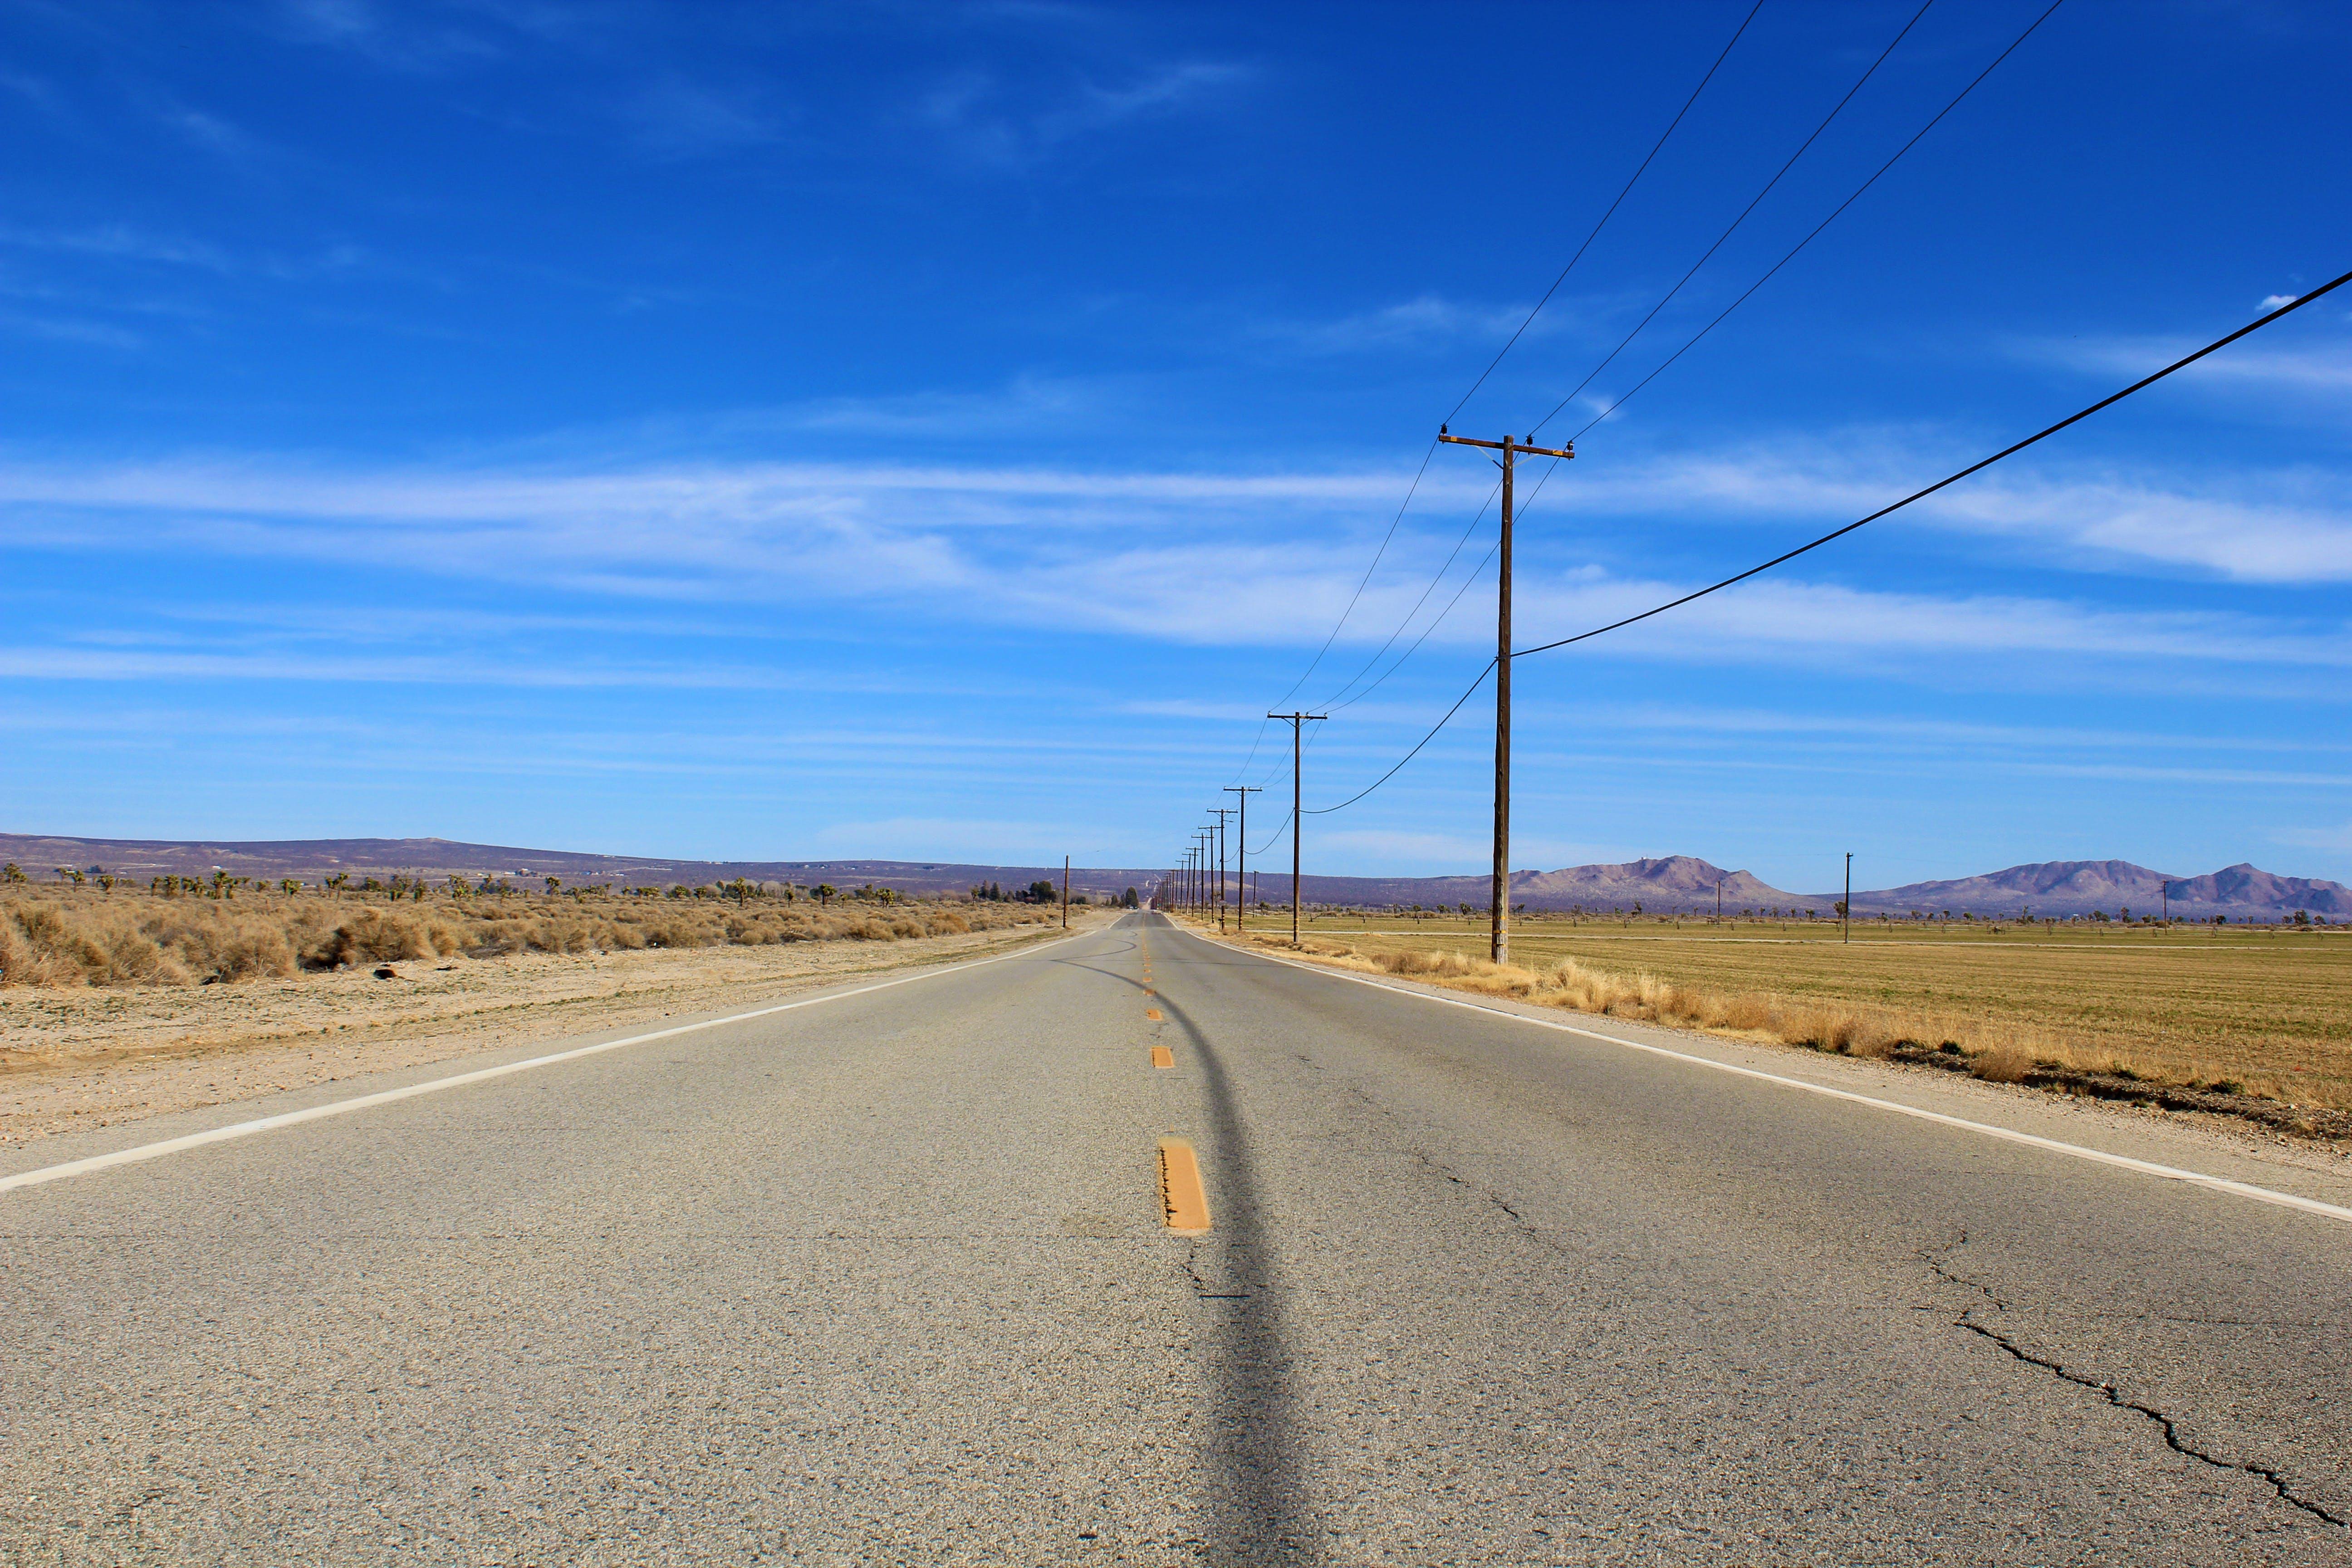 Free stock photo of road